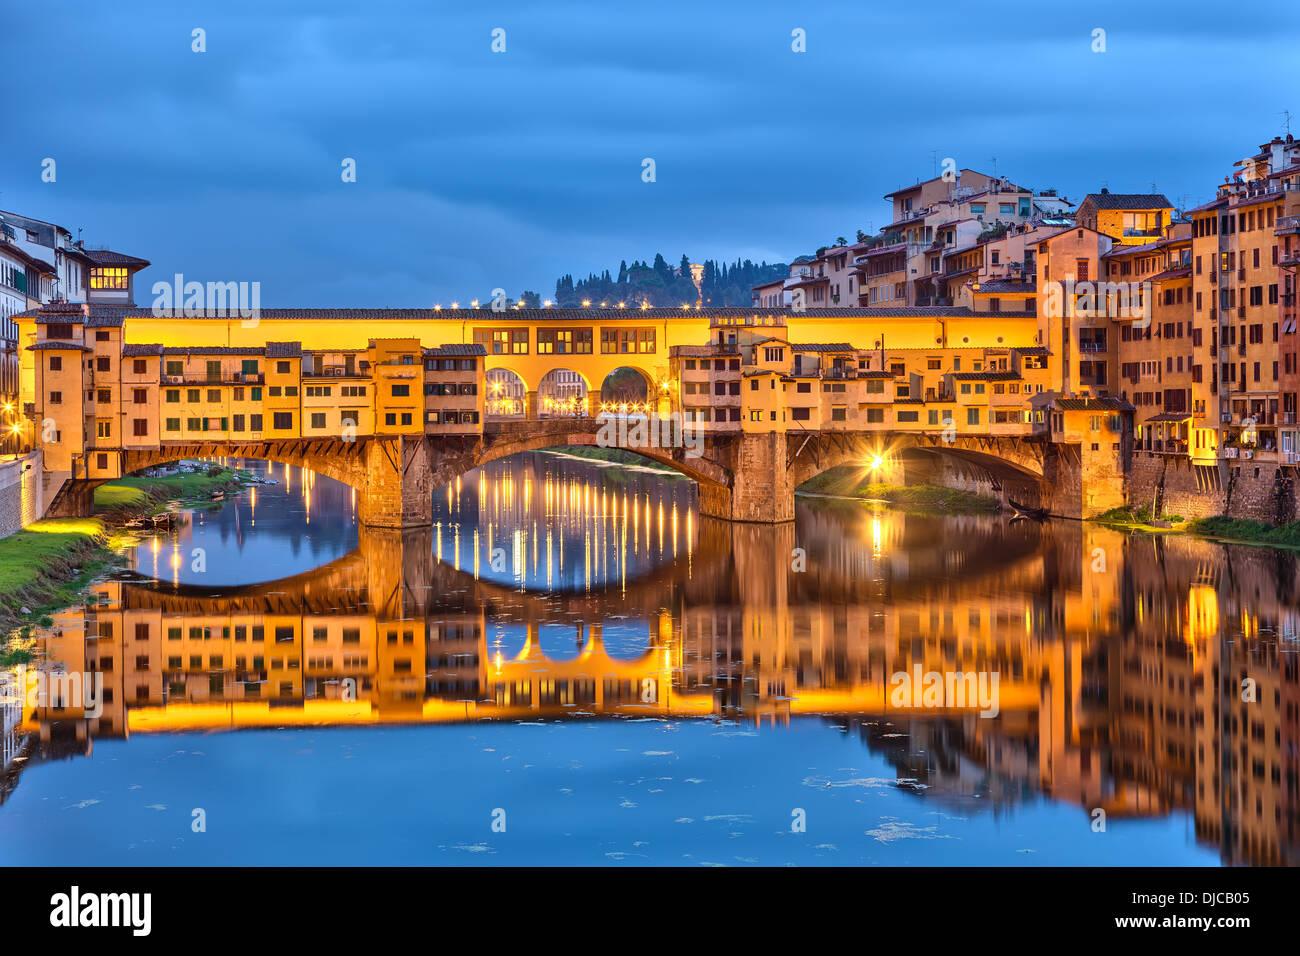 Ponte Vecchio in Florence - Stock Image